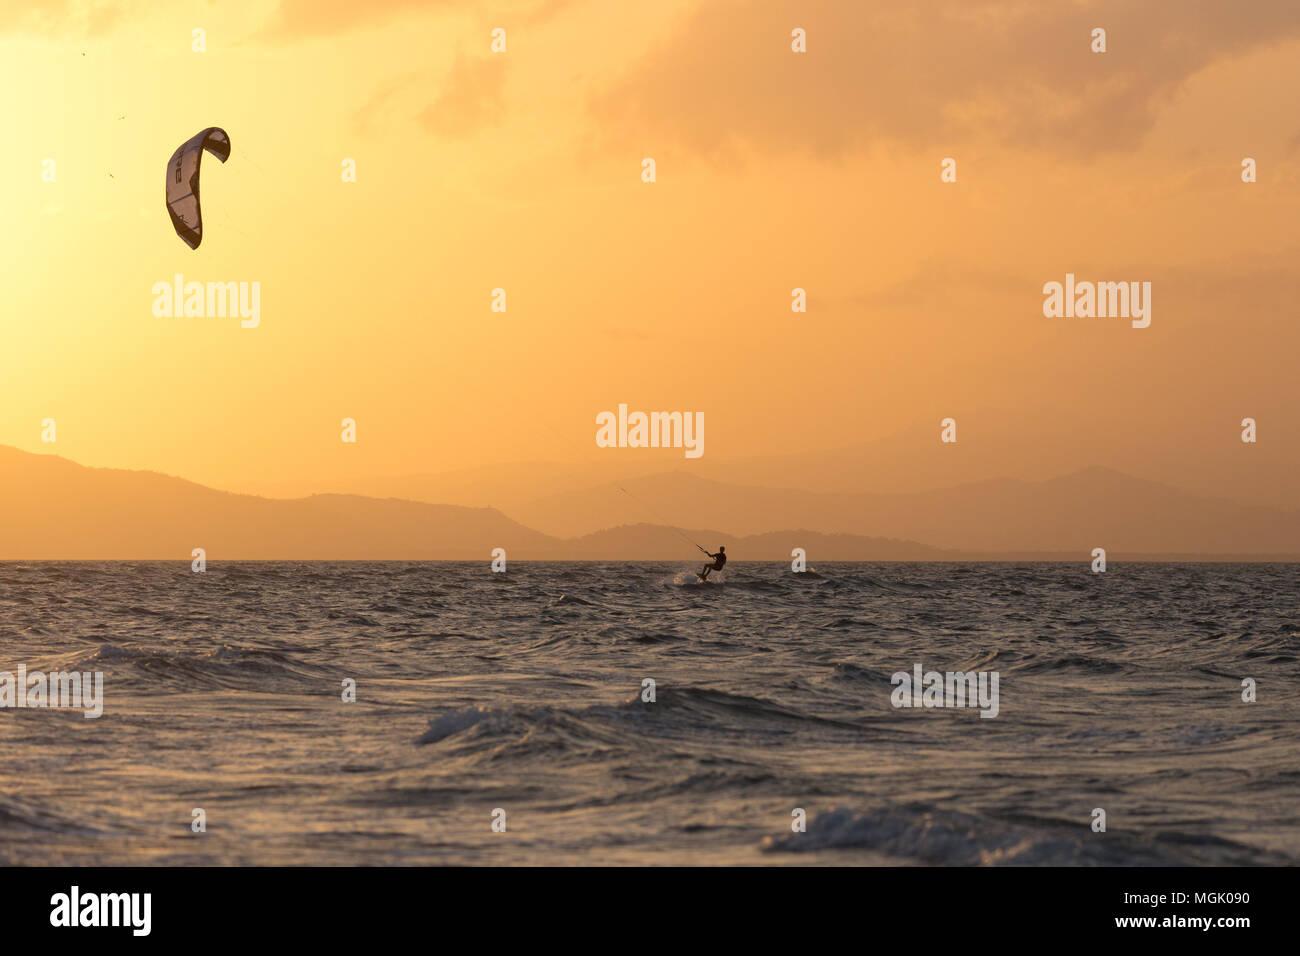 Kiteboarding in the sunset at Punta Chame, Panama - Stock Image